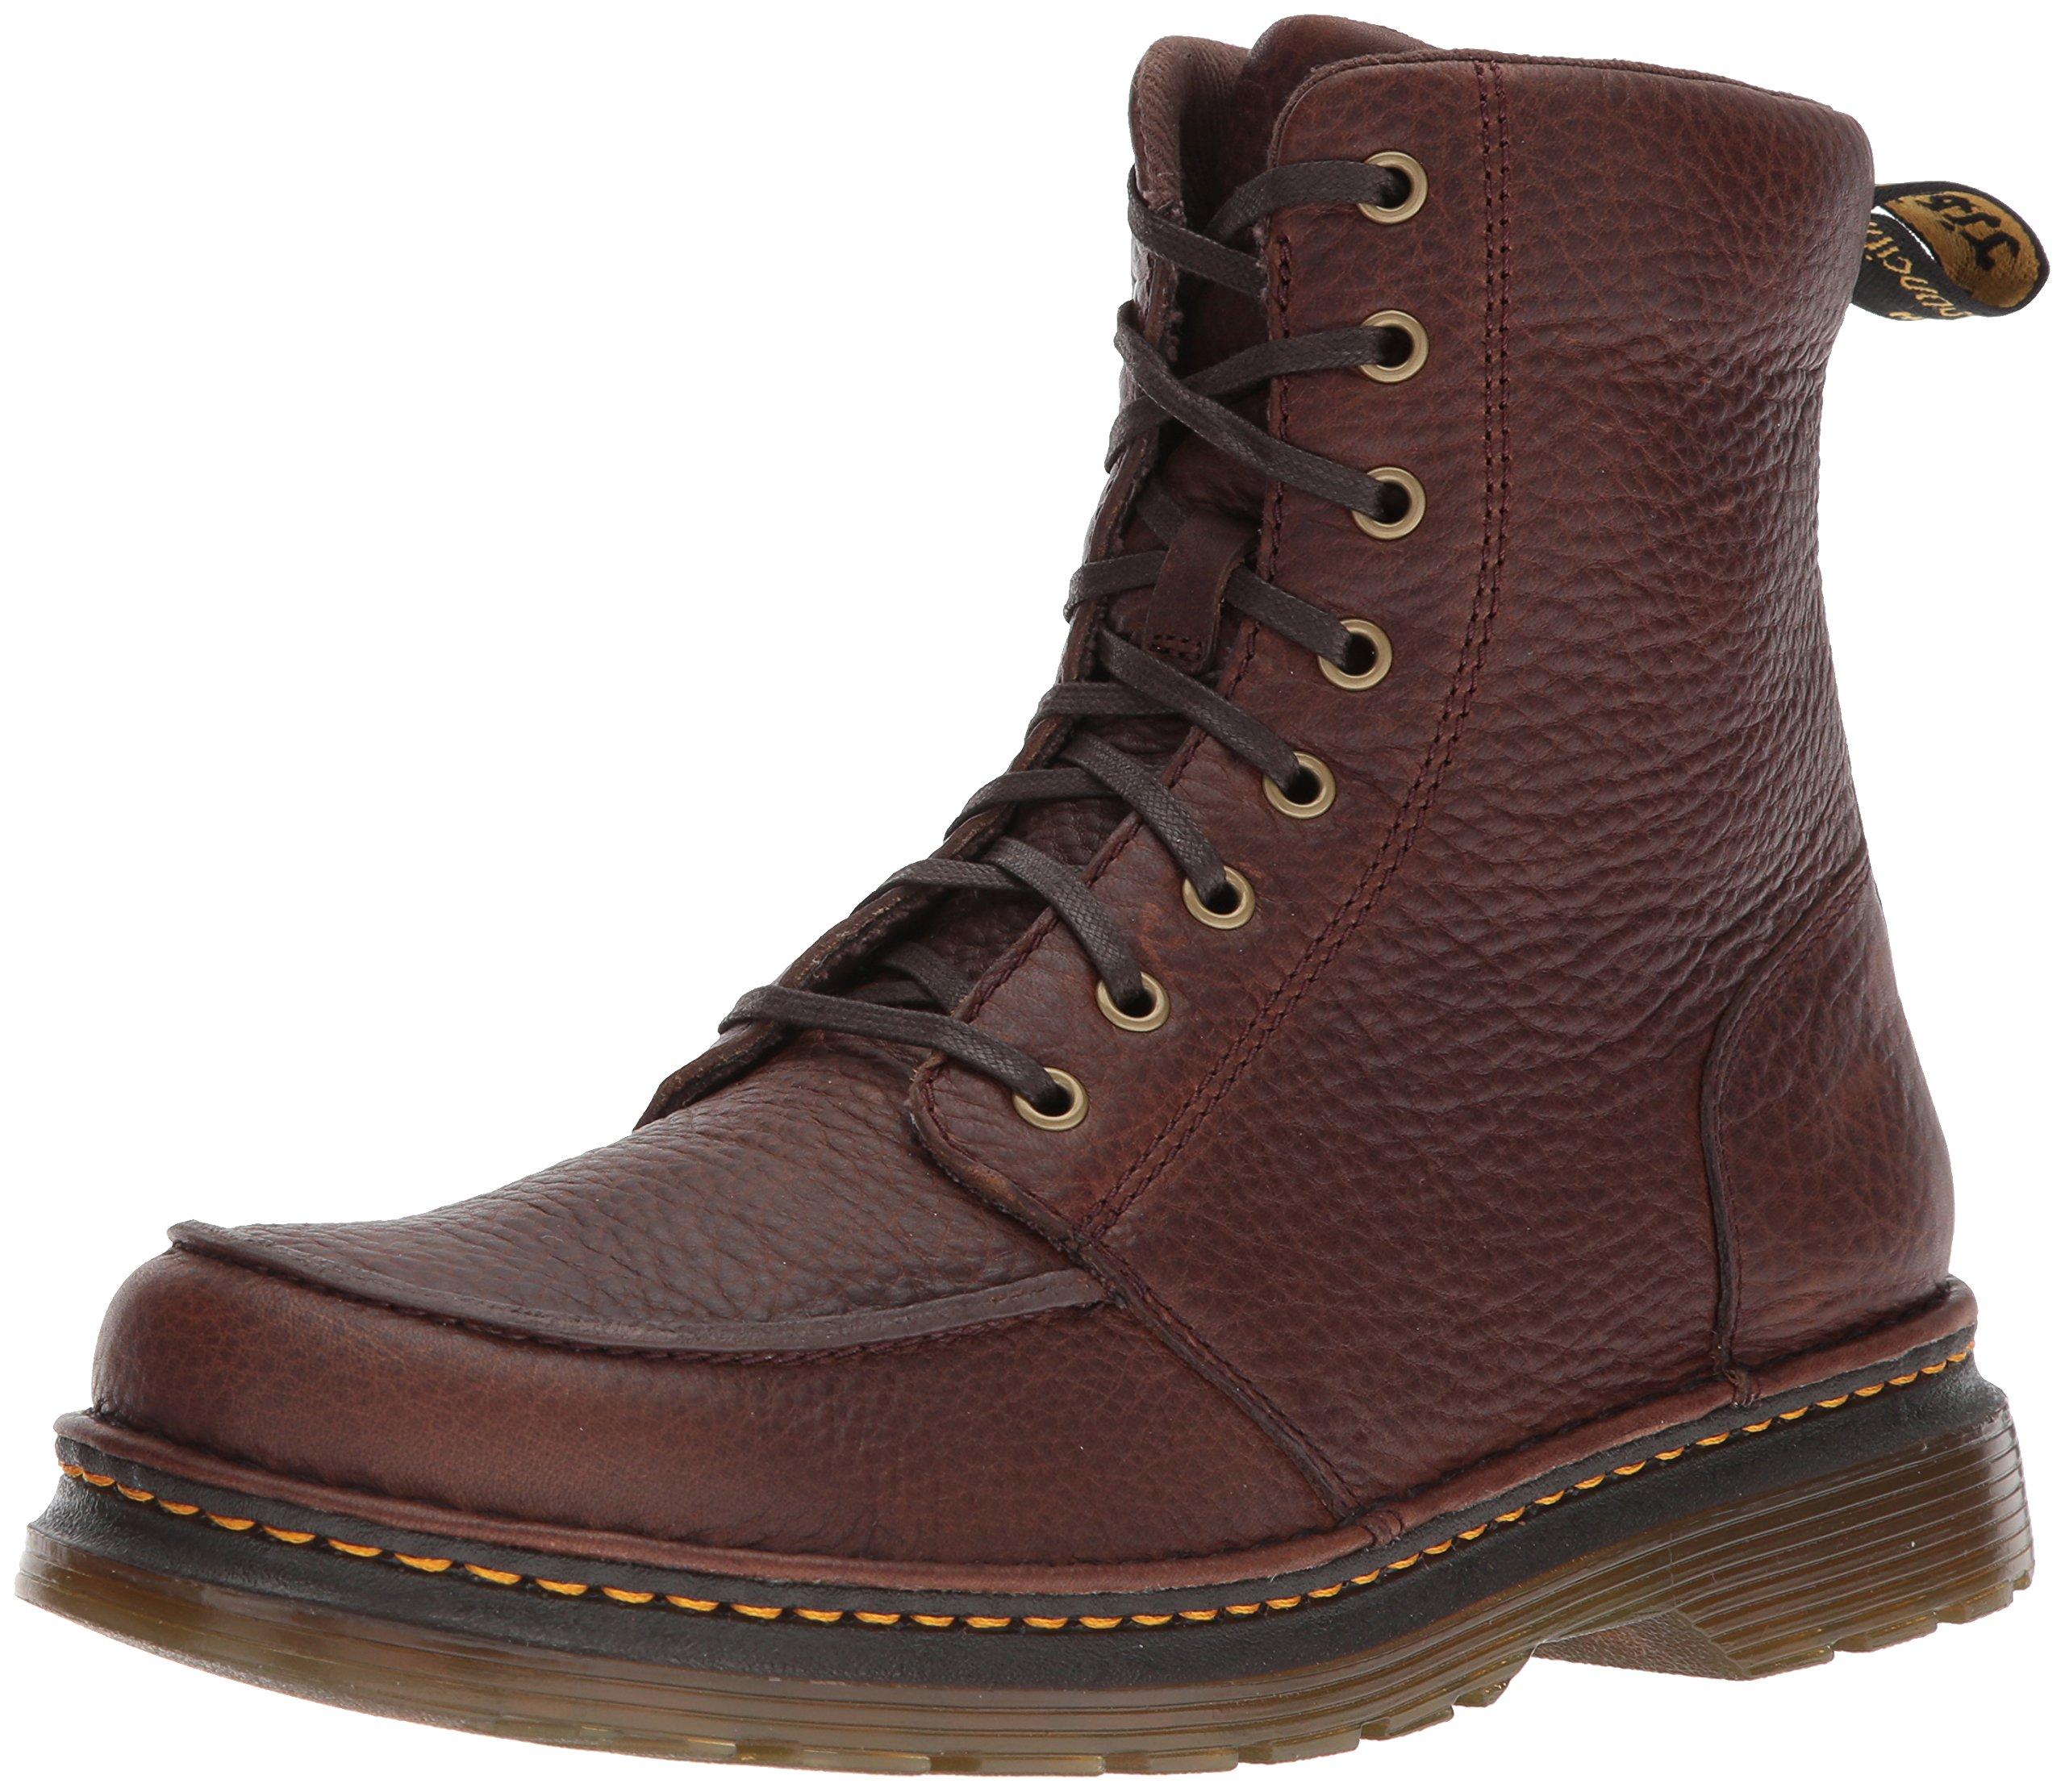 Dr. Martens Lombardo Dark Brown Fashion Boot, 9 Medium UK (10 US) by Dr. Martens